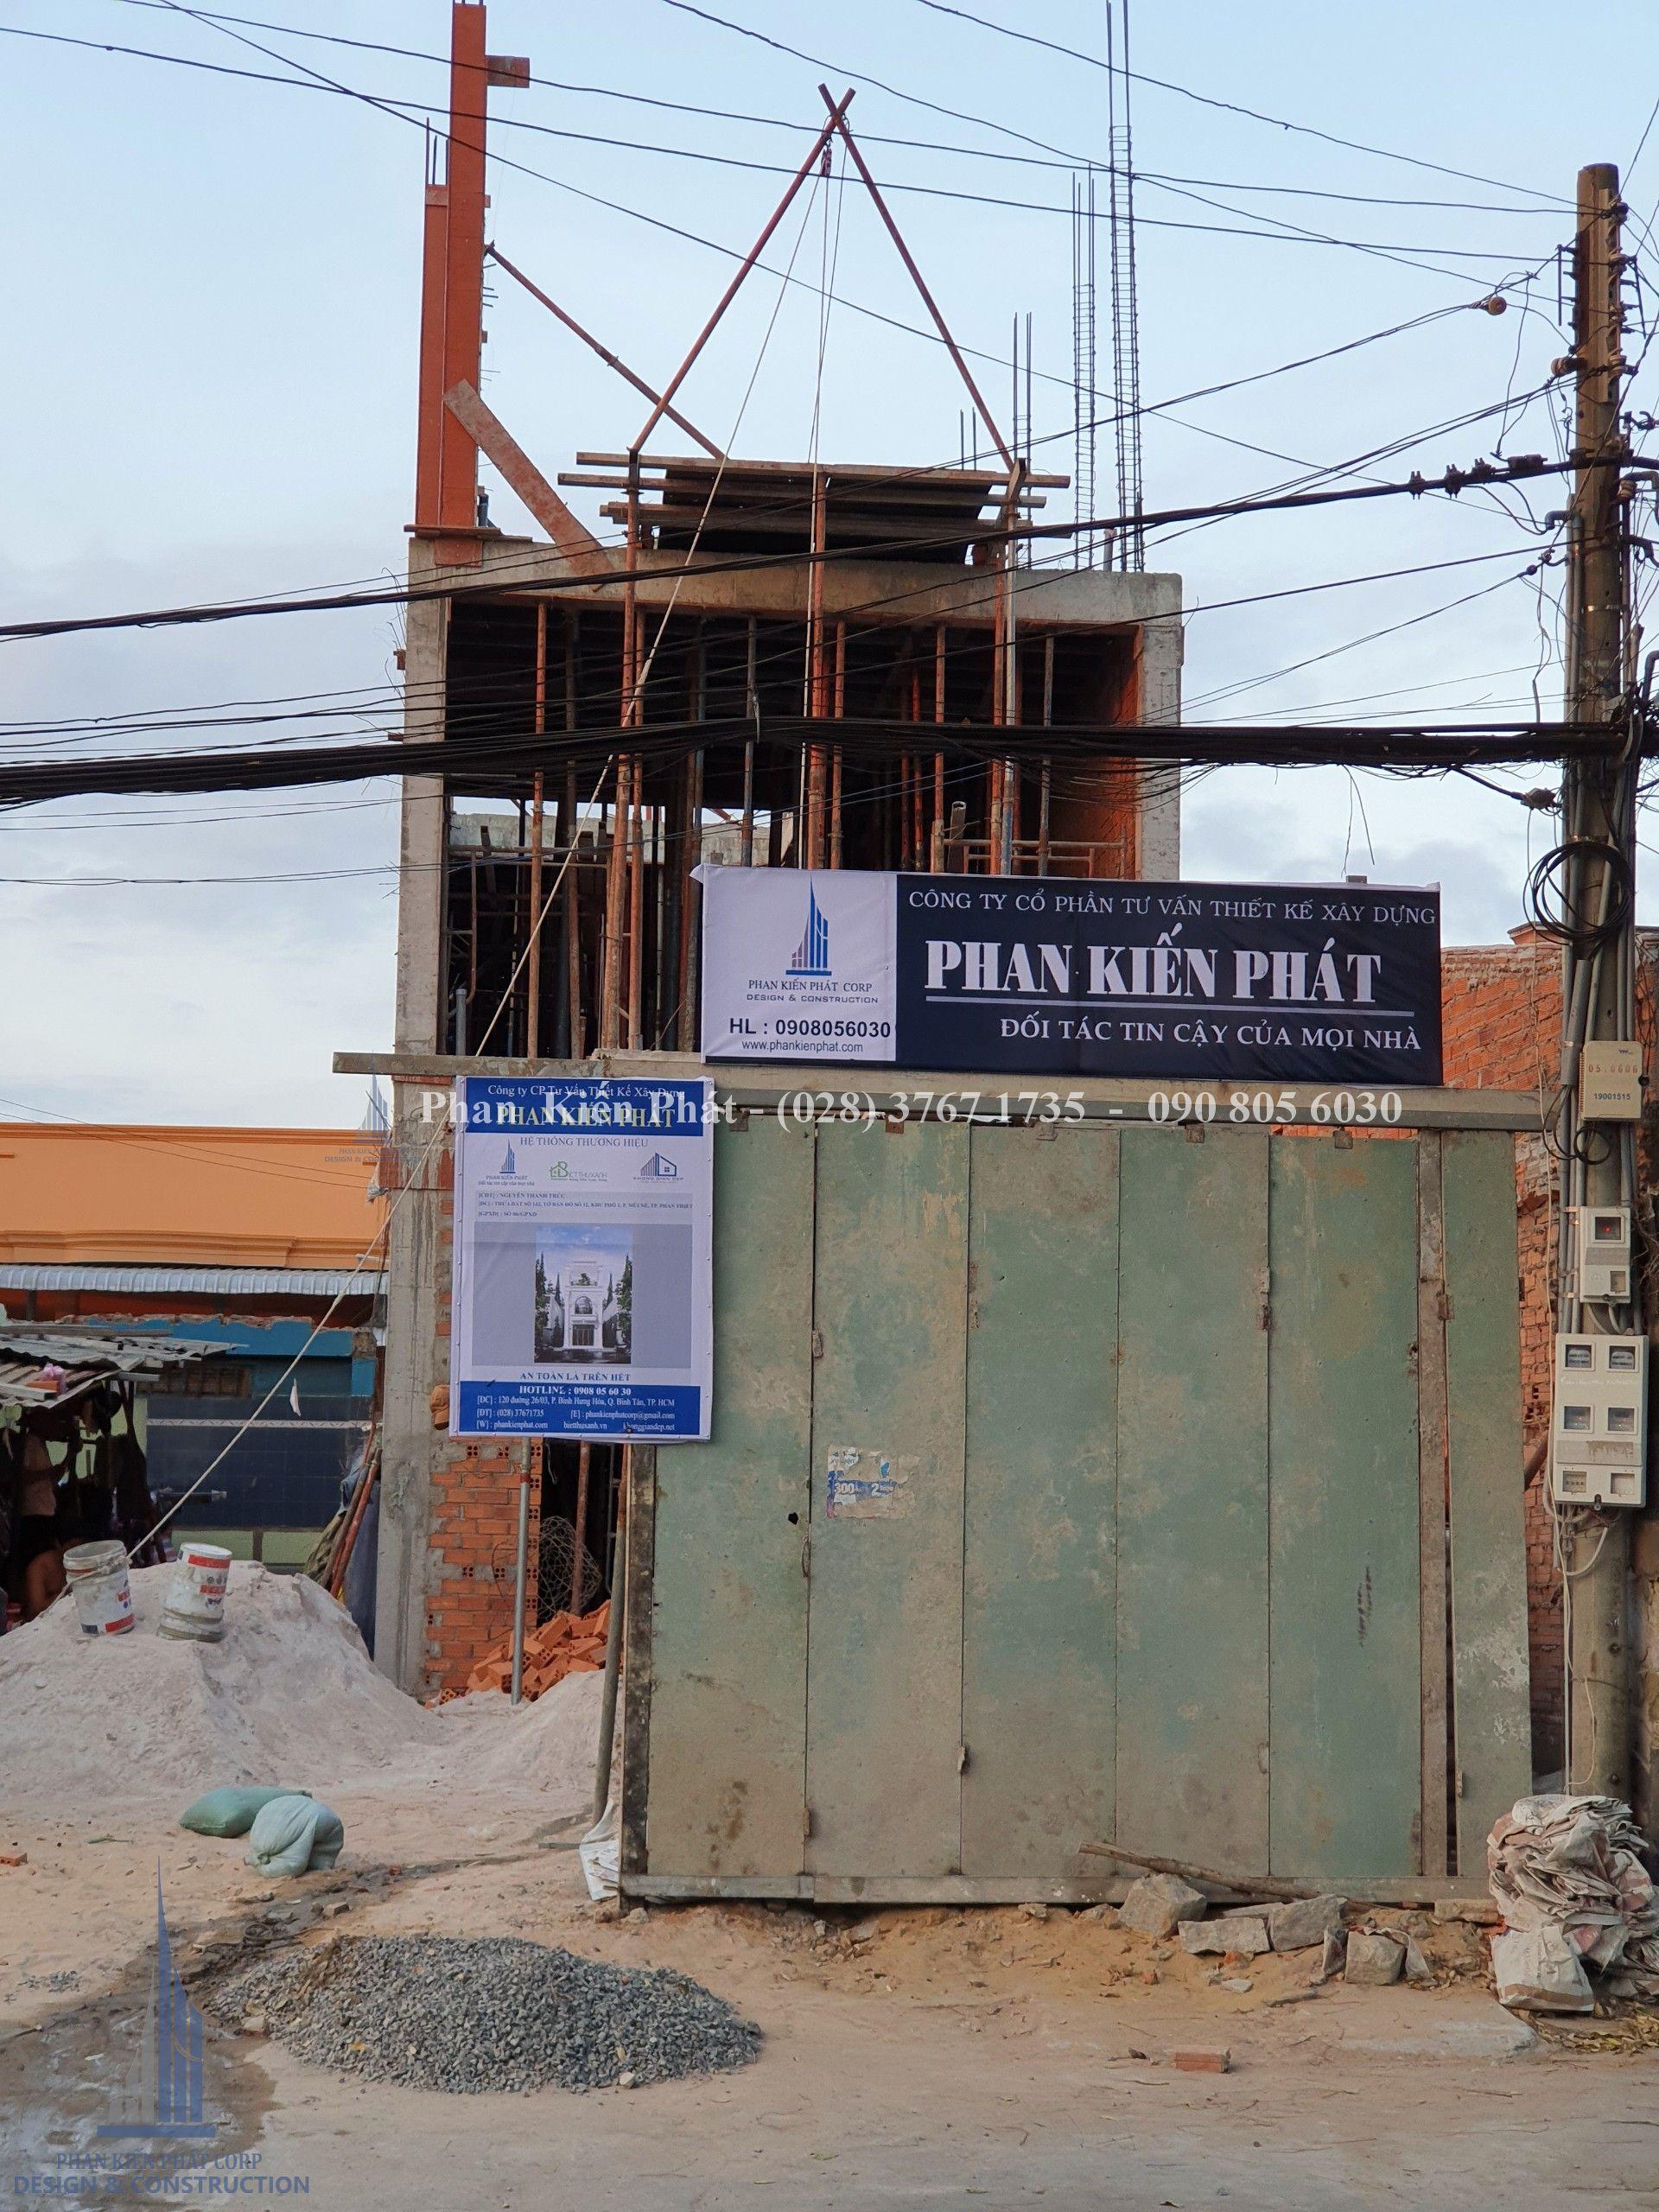 Thi Cong Nha Pho Co Dien Dep Tại Phan Thiet 9 Tkxd